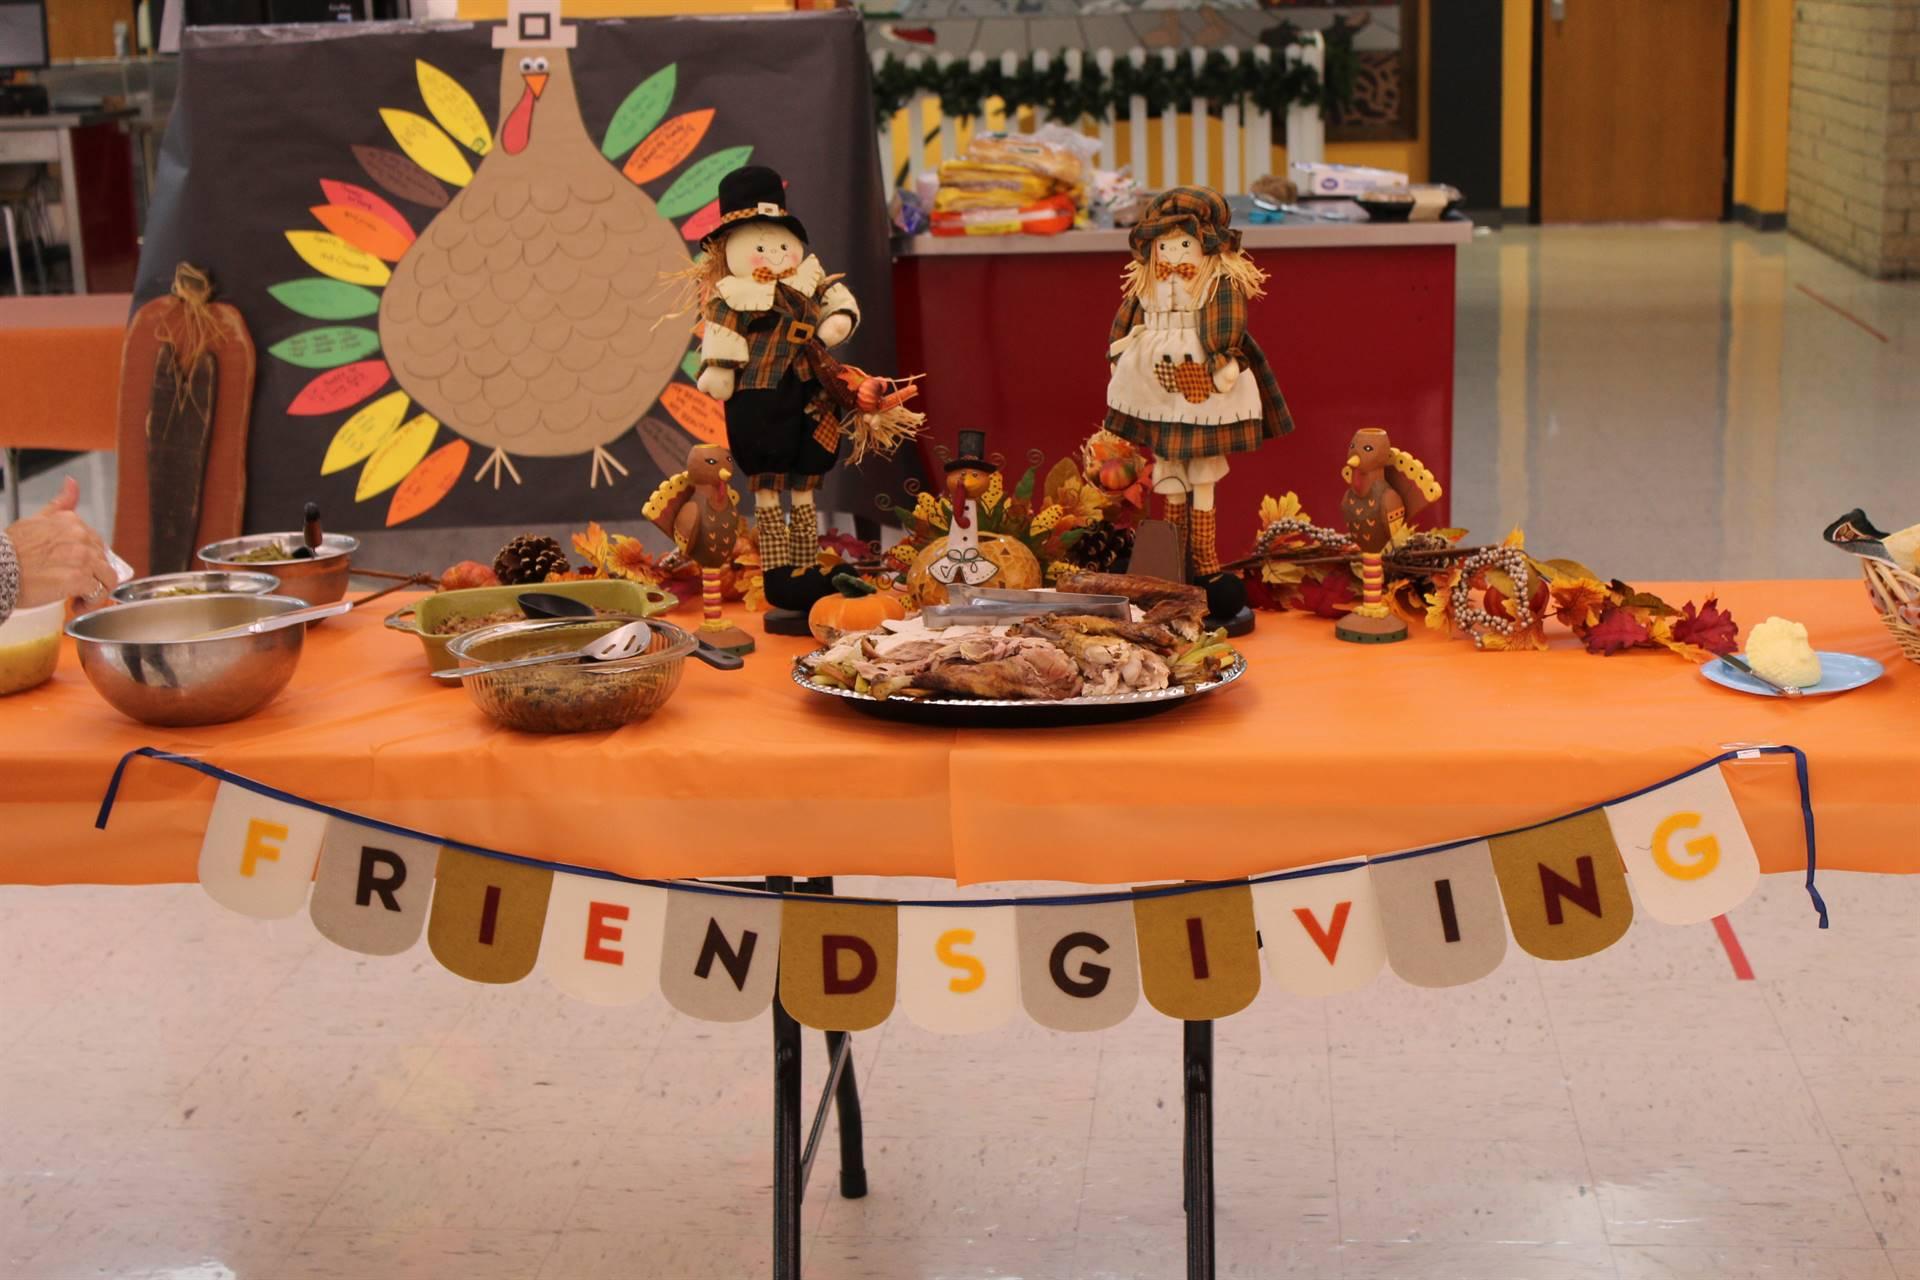 Friendsgiving food table